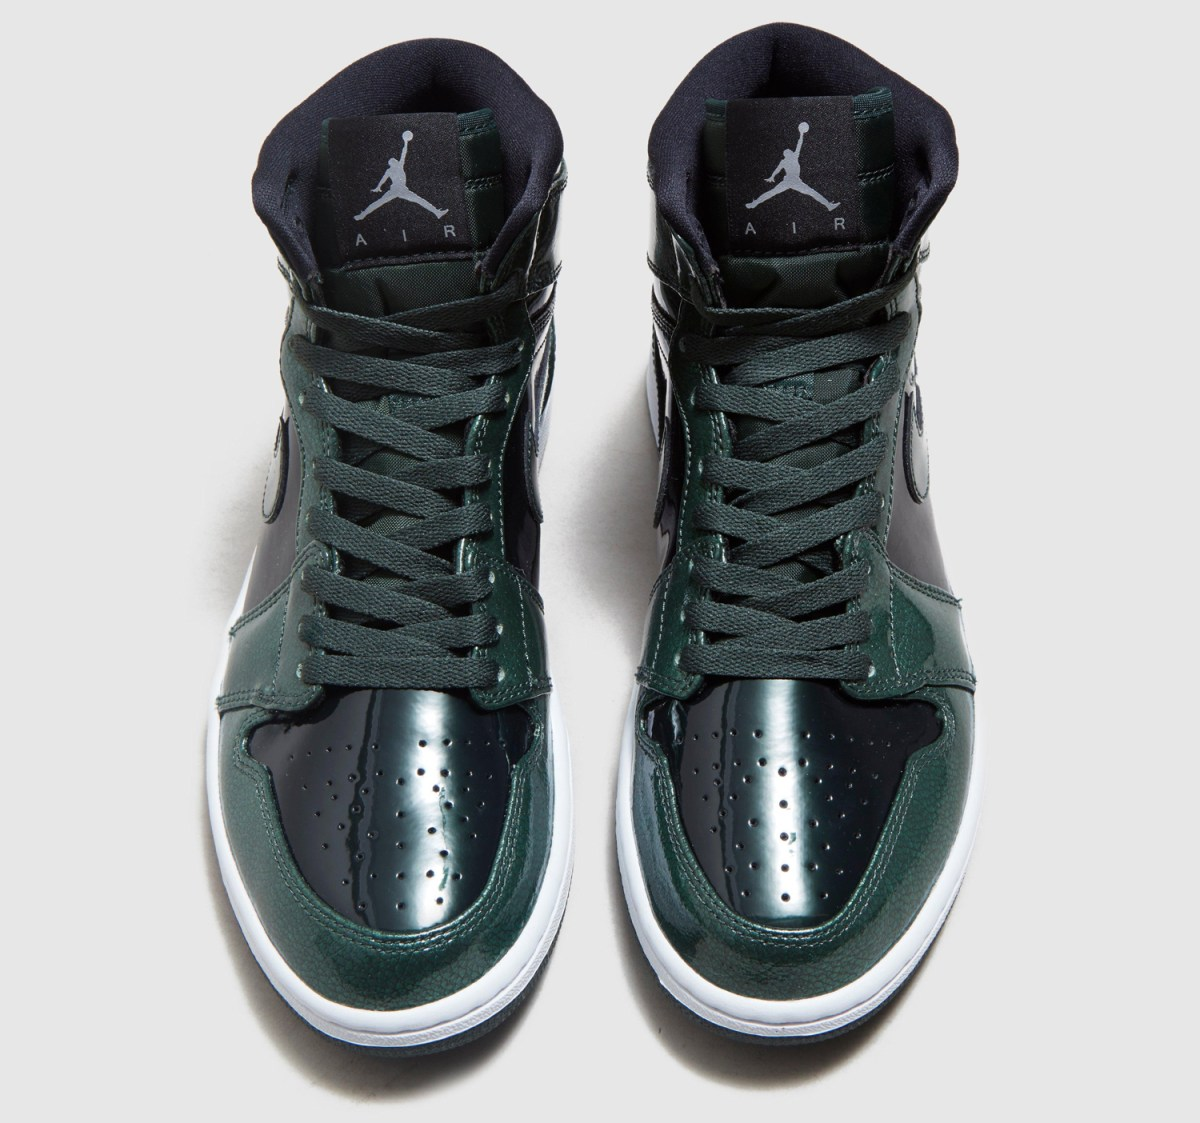 Air Jordan 1 Gorge Green Patent Leather 332550-300 Top